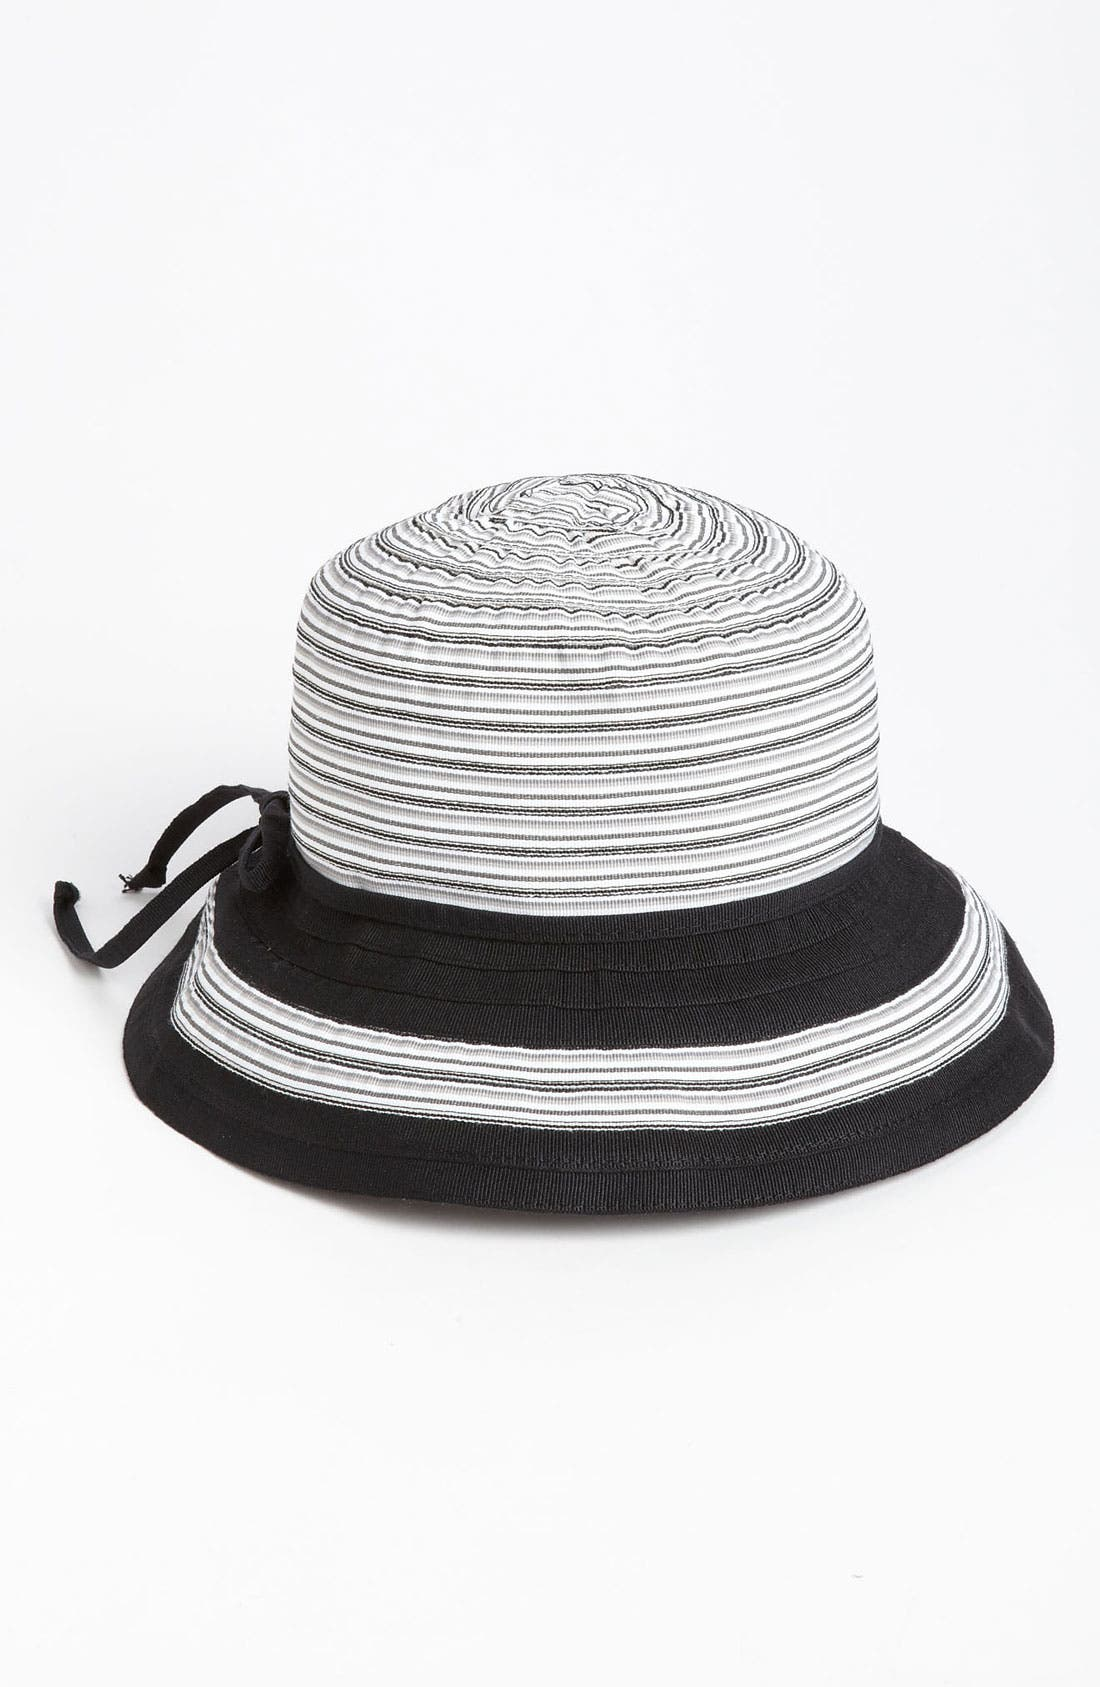 Alternate Image 1 Selected - Nordstrom Striped Bucket Hat